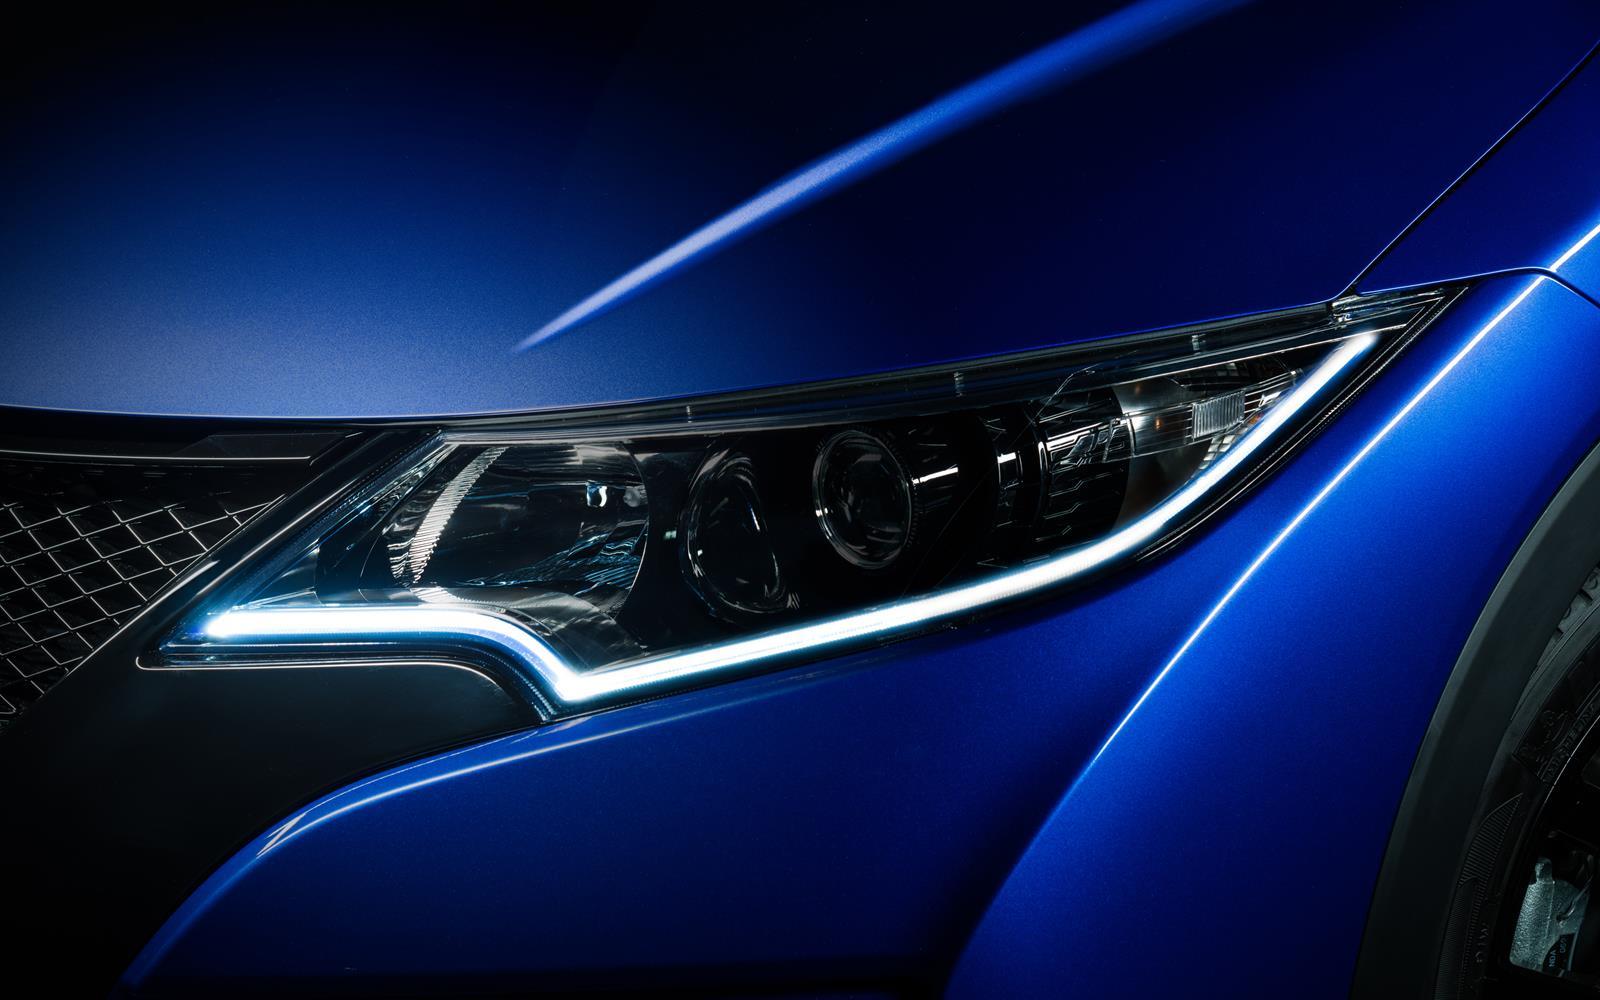 honda civic sport 2014 led headlight detail front seat driver. Black Bedroom Furniture Sets. Home Design Ideas